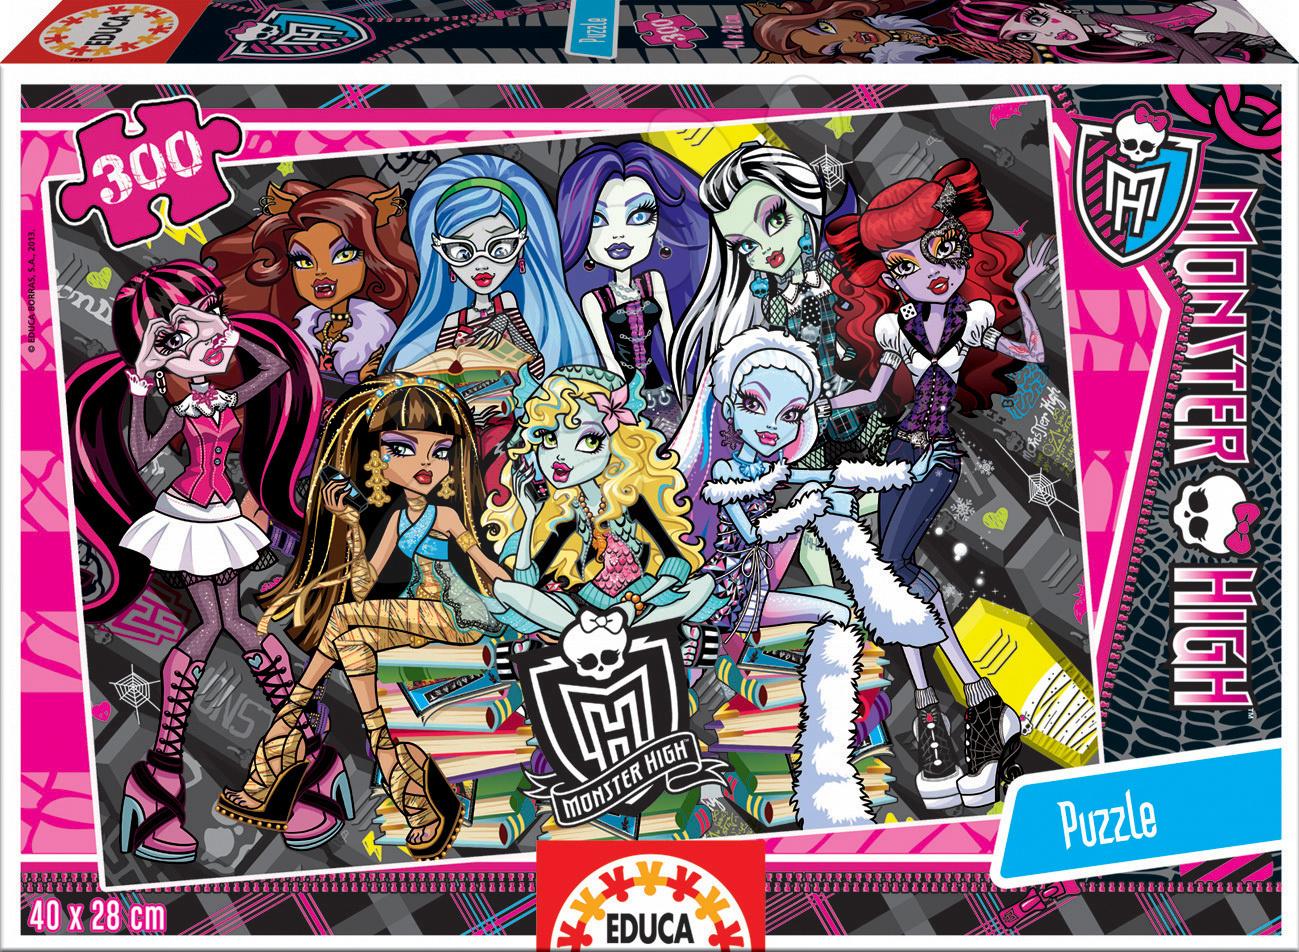 Puzzle Monster High Educa 300 dílů od 8 let